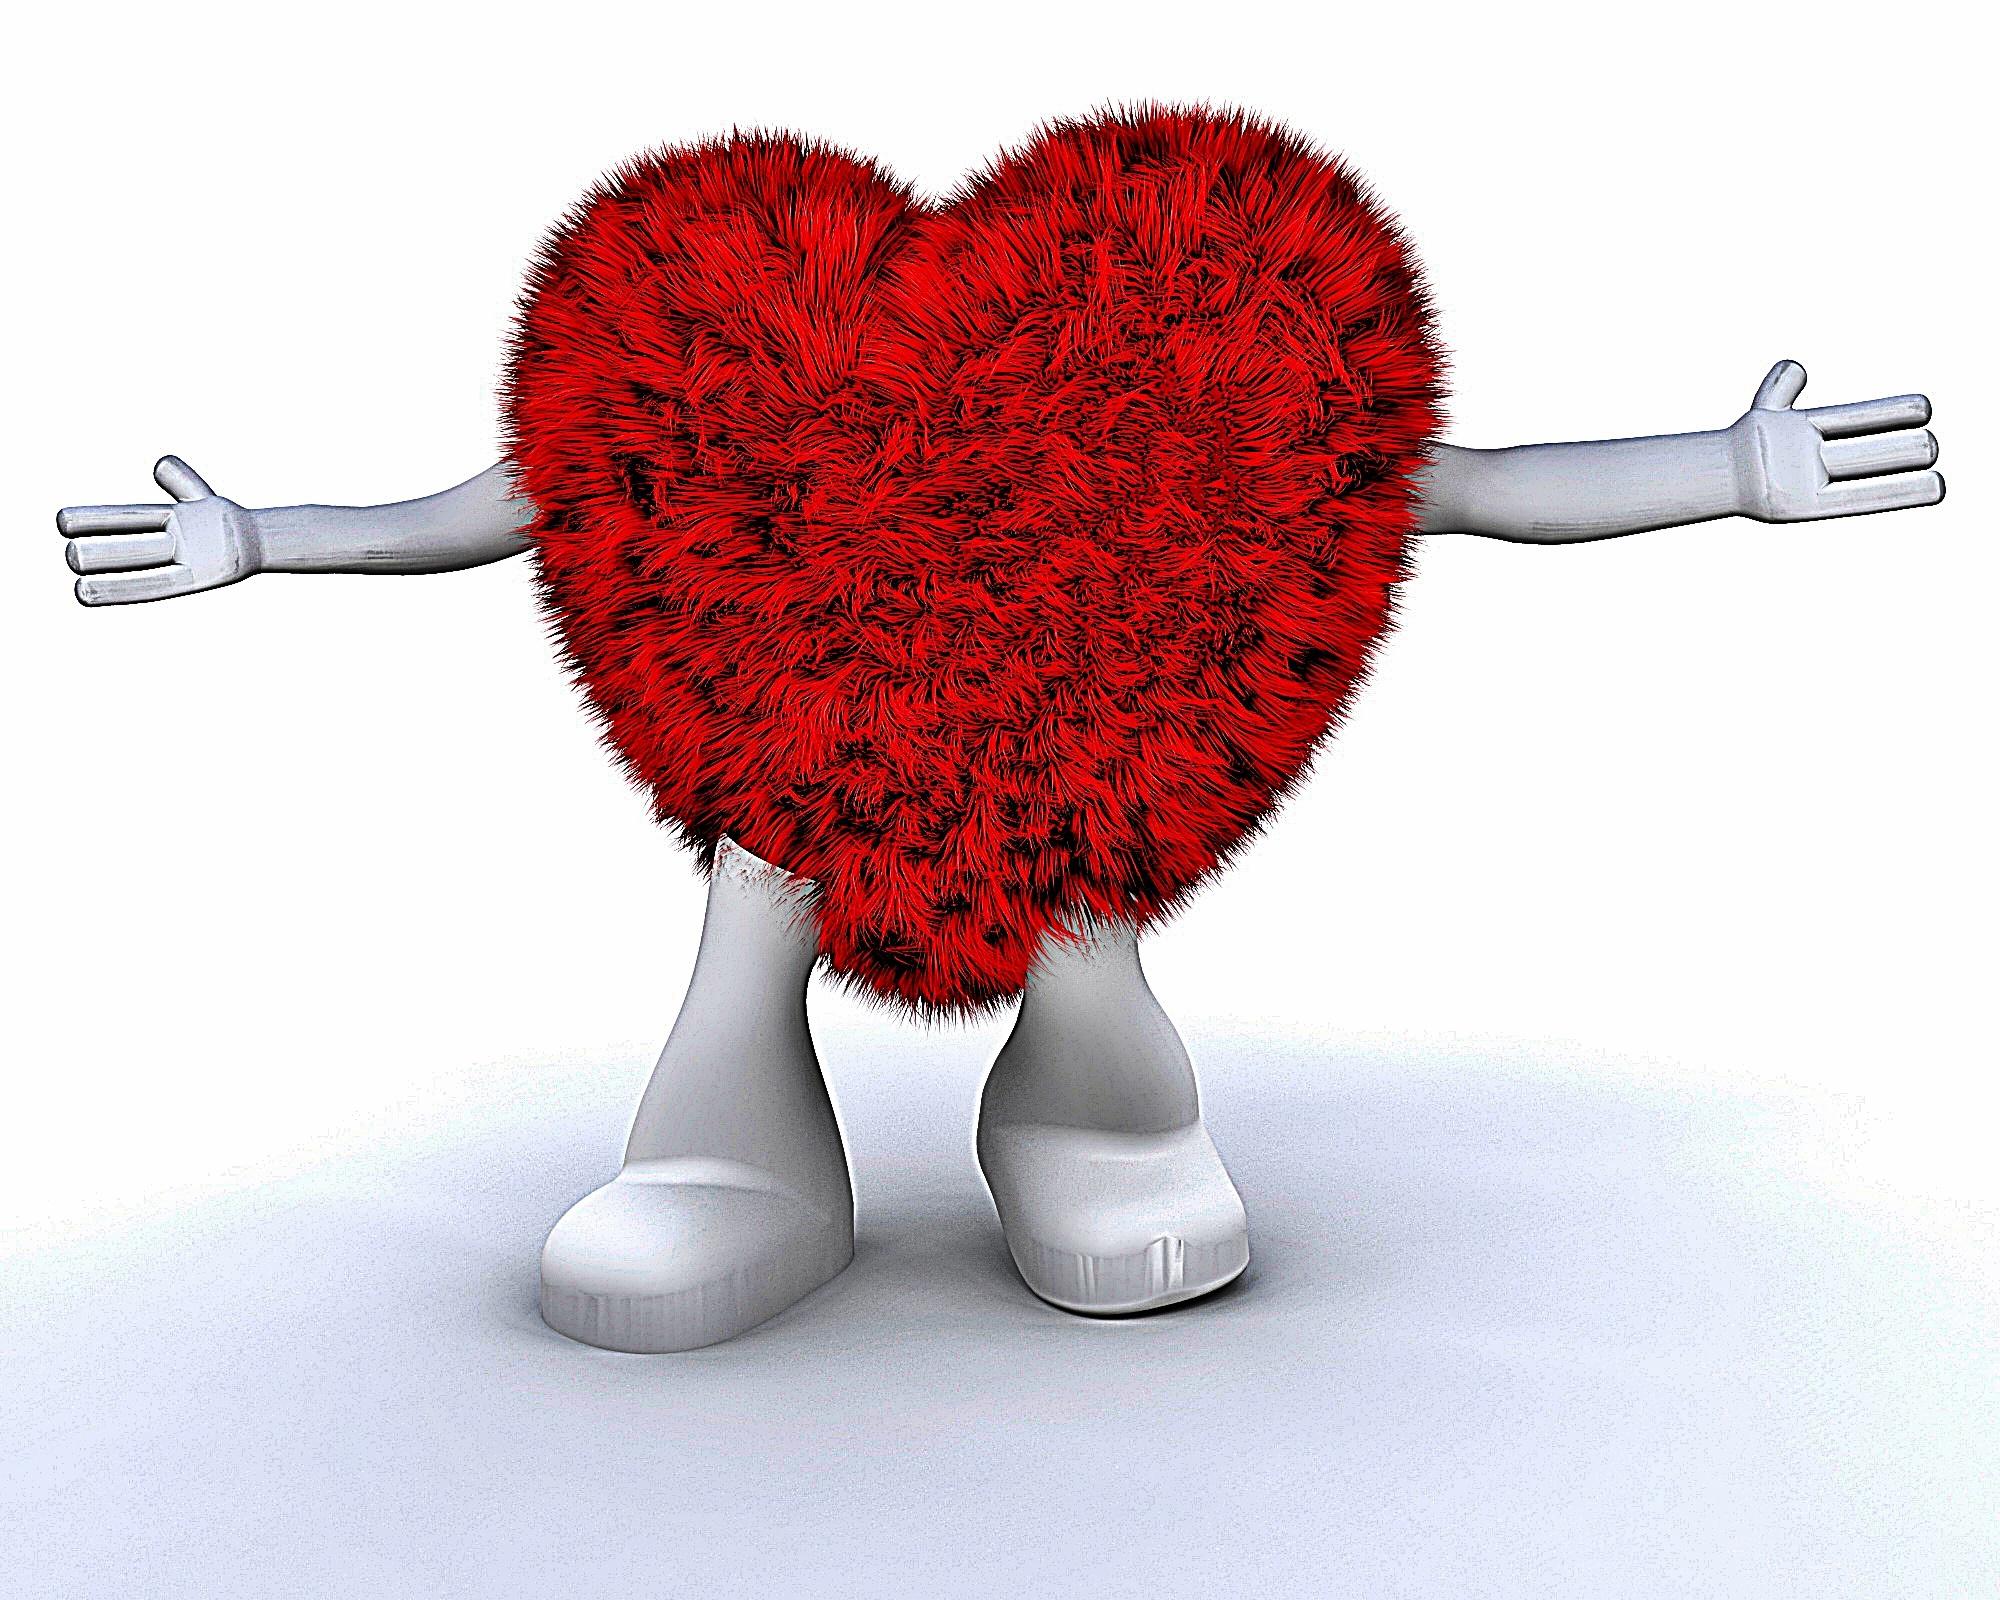 Furry heart dude